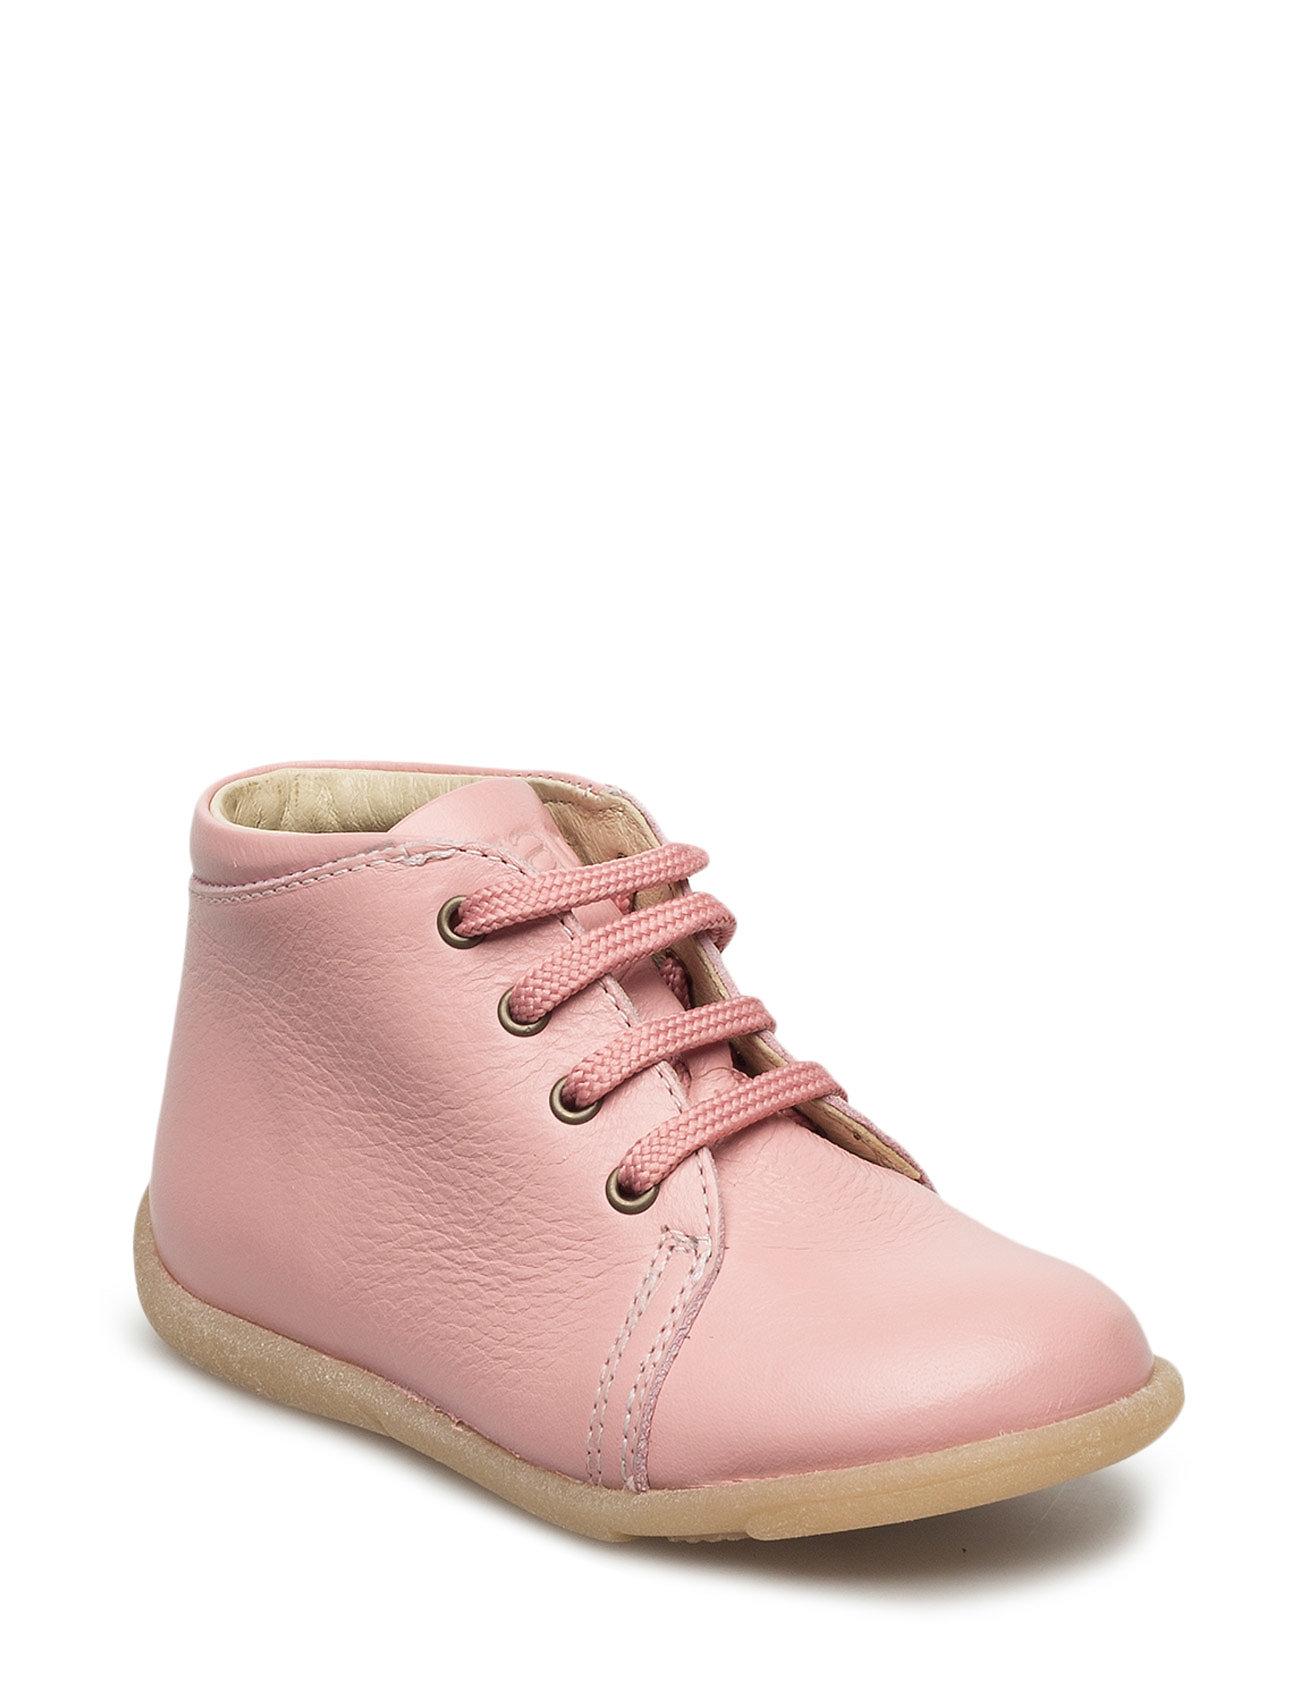 Ecological Hand Made Low Boot Arauto RAP Sko & Sneakers til Børn i